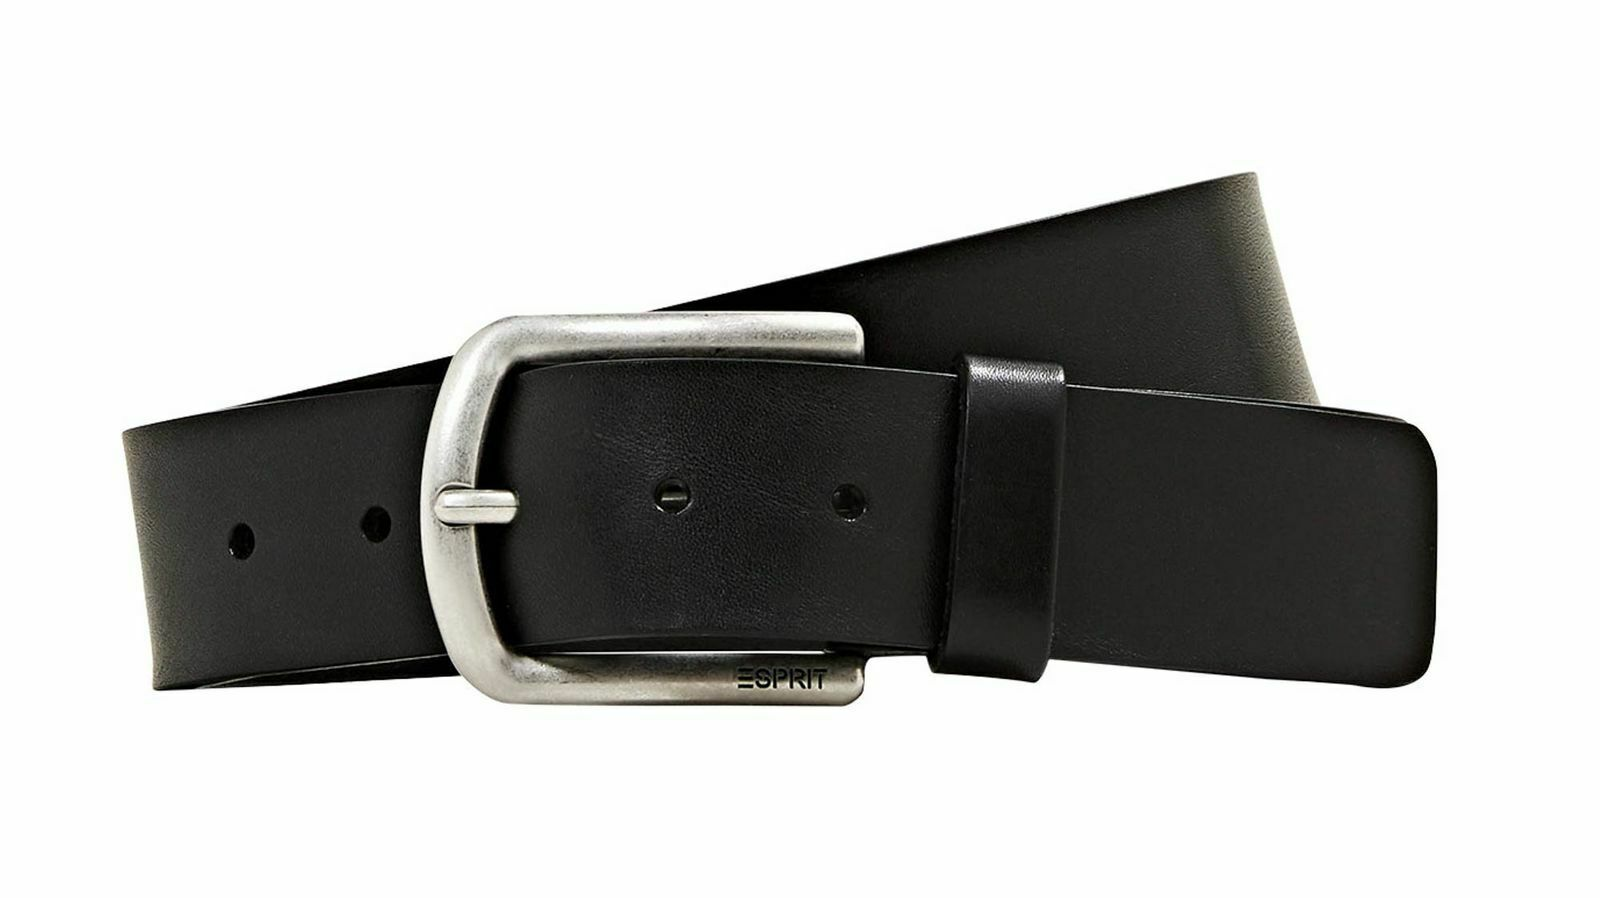 ESPRIT John Belt W95 Gürtel Accessoire Black Schwarz Neu